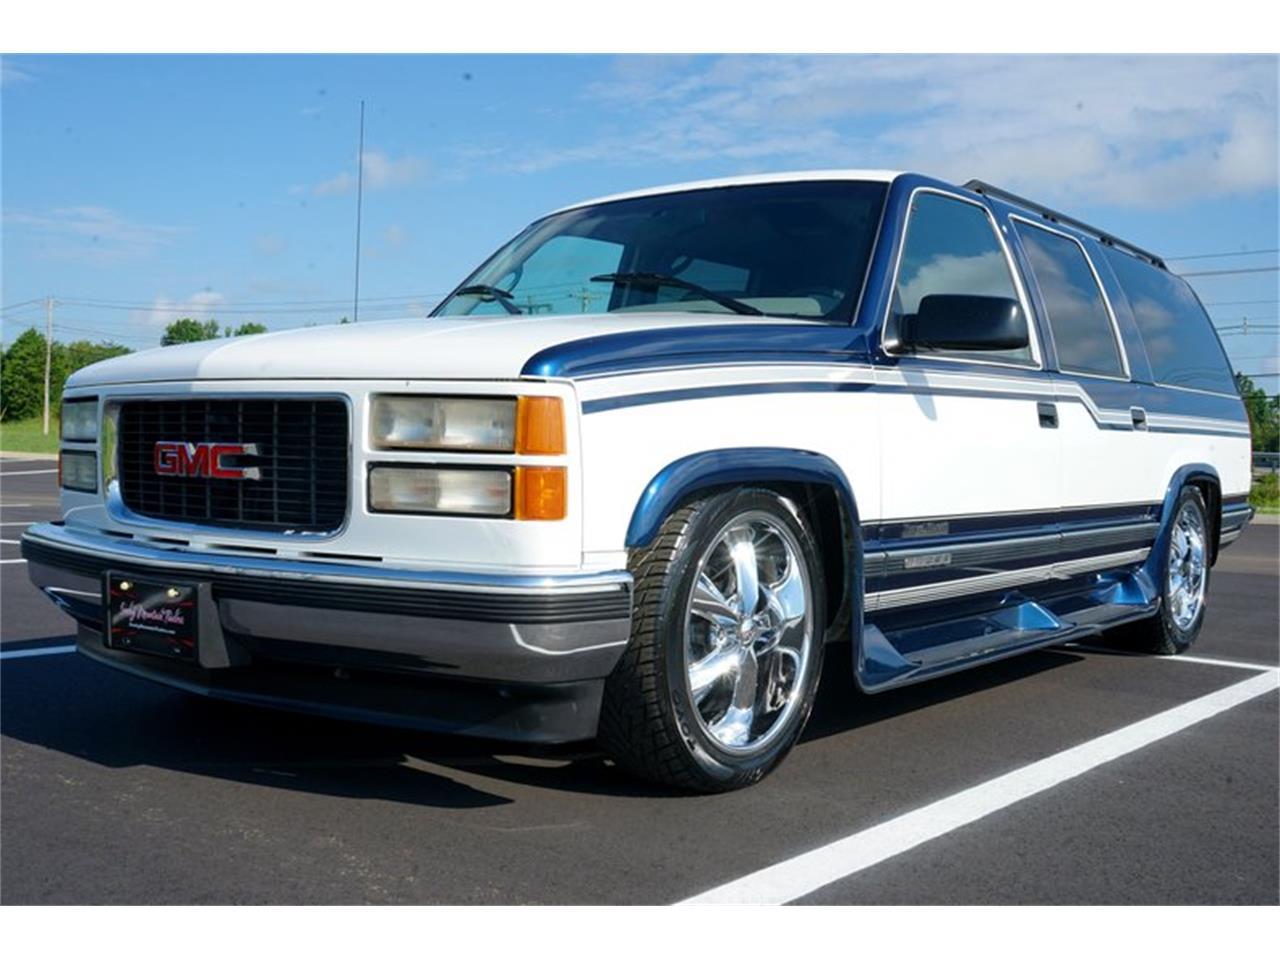 1995 GMC Suburban (CC-1383602) for sale in Lenoir City, Tennessee